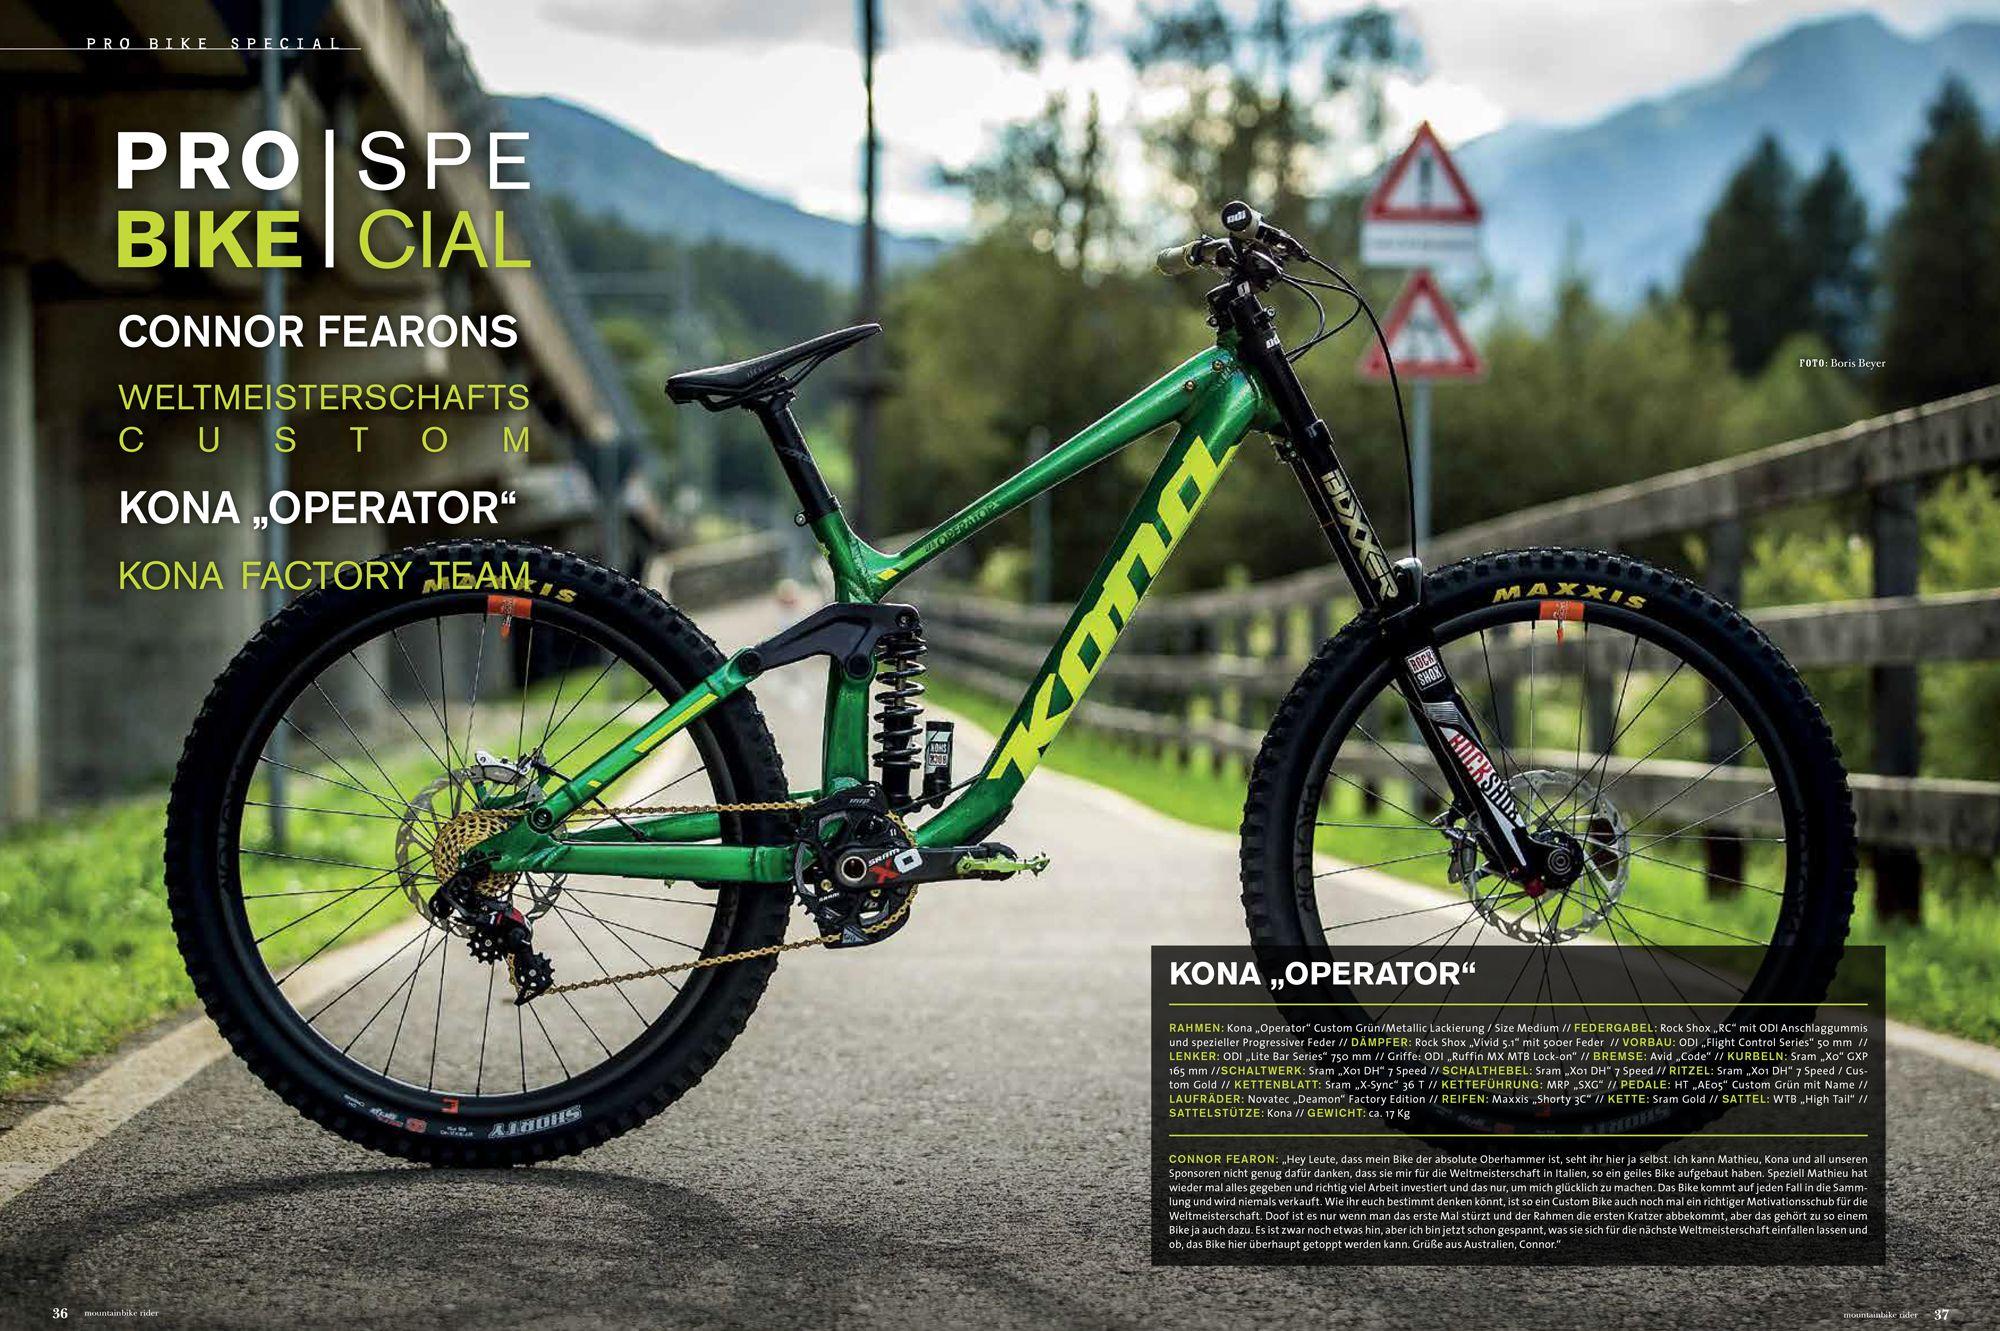 Pin By Venom On Mtb Lif35tyle Mountian Bike Enduro Mtb Kona Bikes